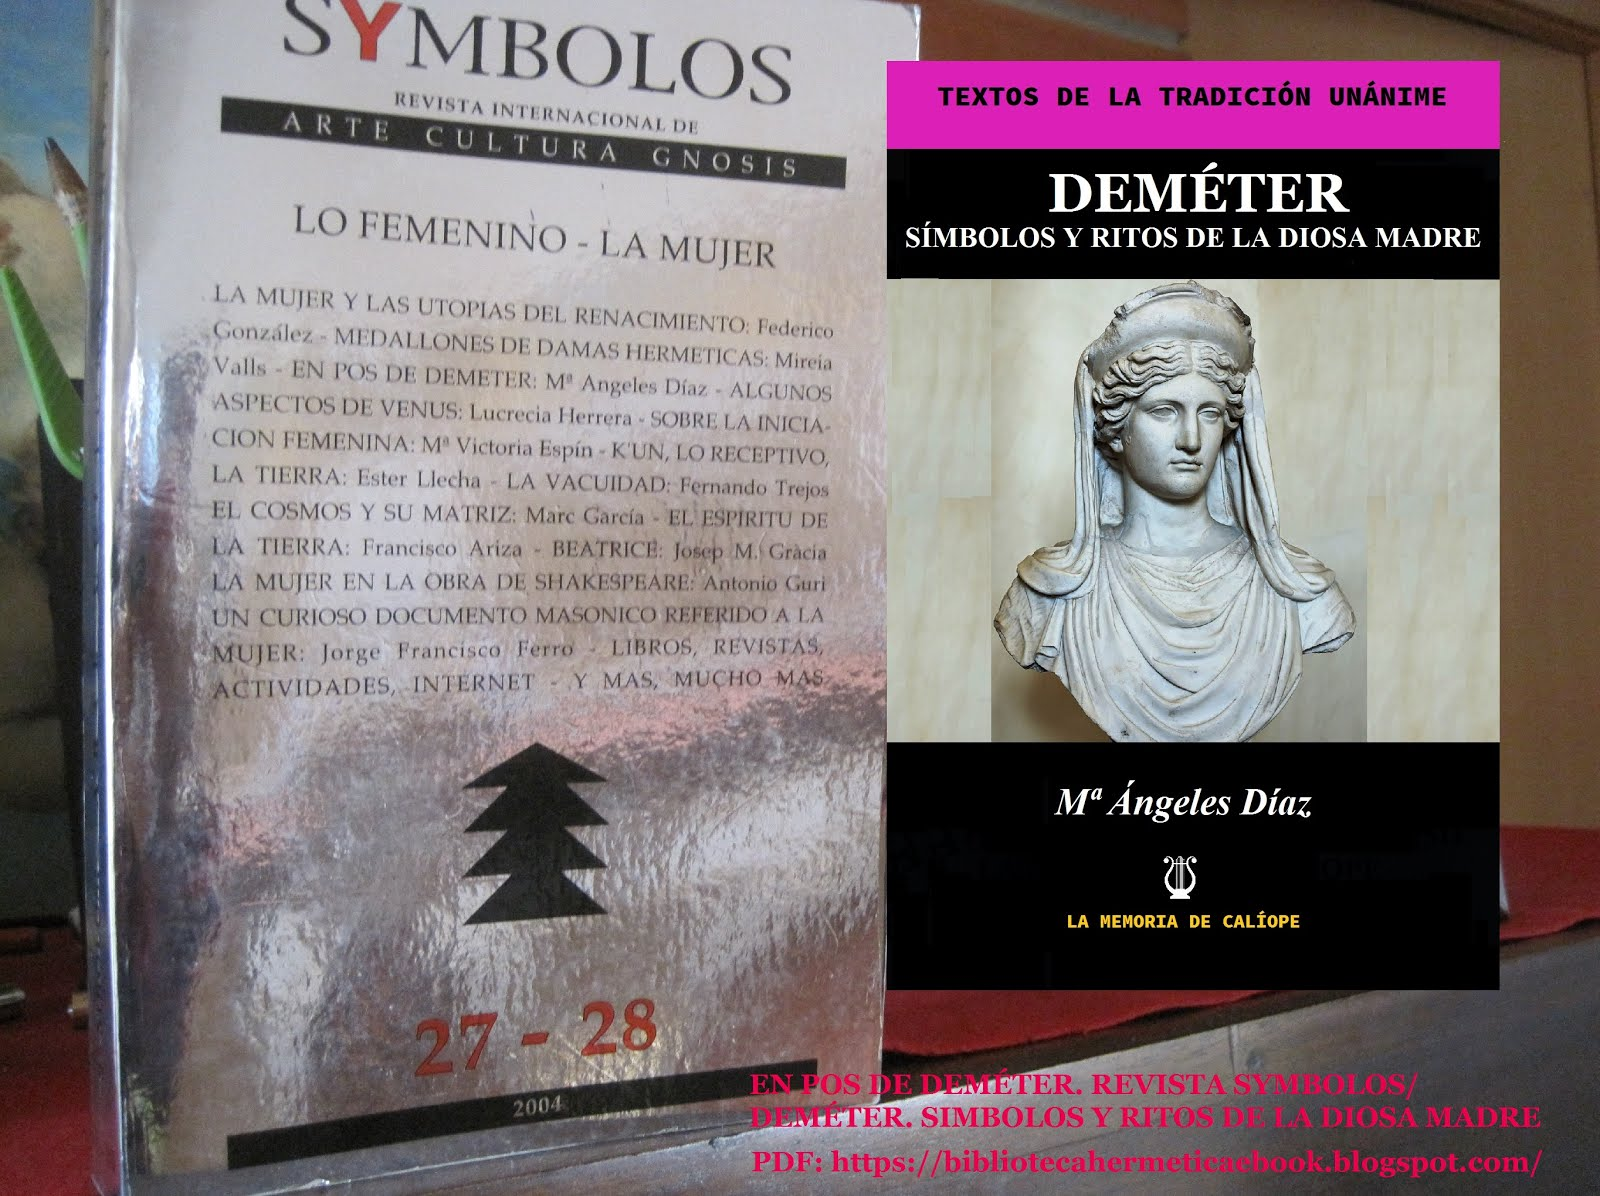 BIBLIOTECA HERMÉTICA LA MEMORIA DE CALÍOPE